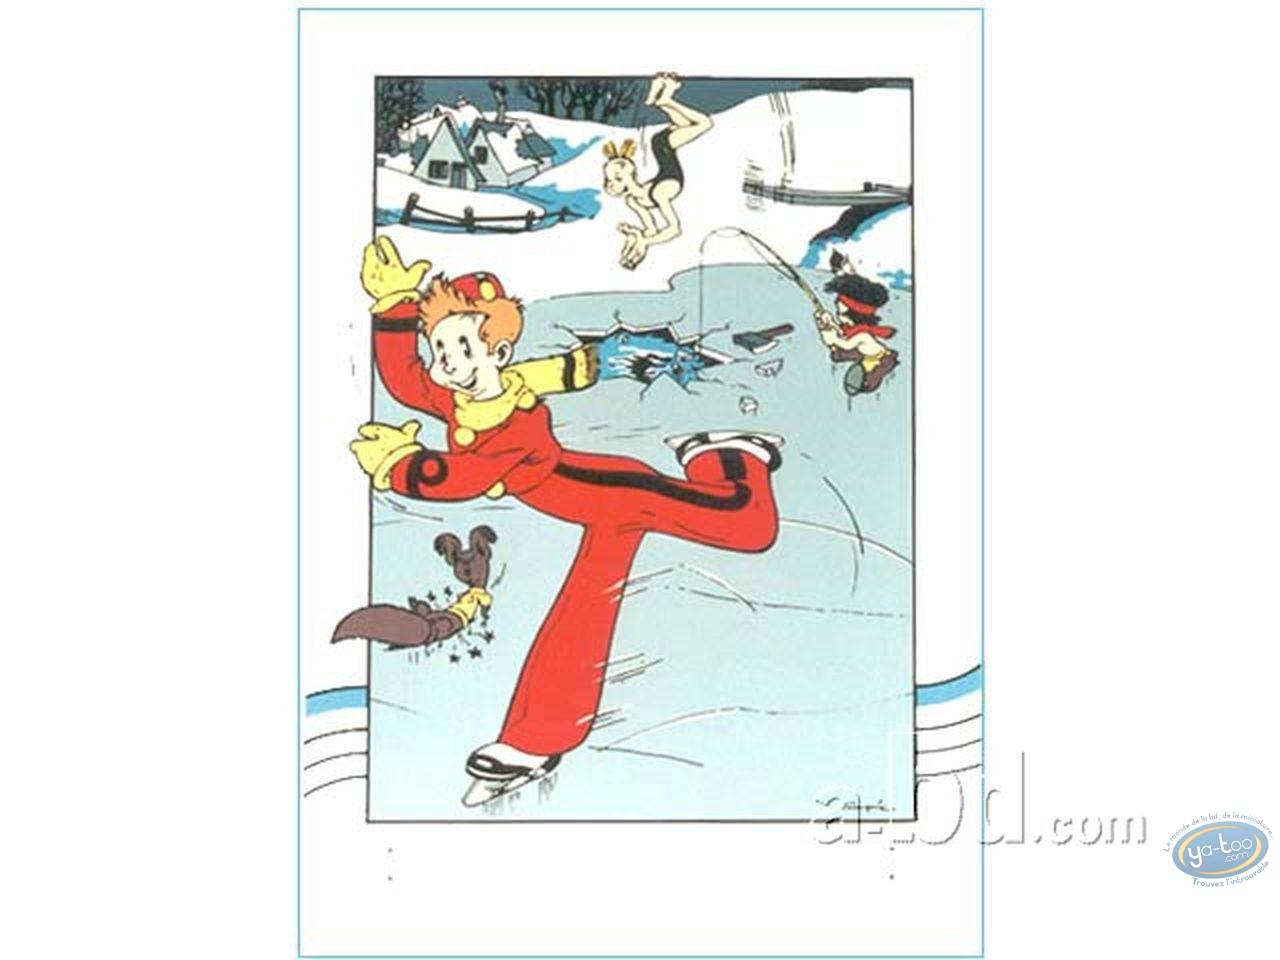 Serigraph Print, Spirou and Fantasio : Spirou ice skater